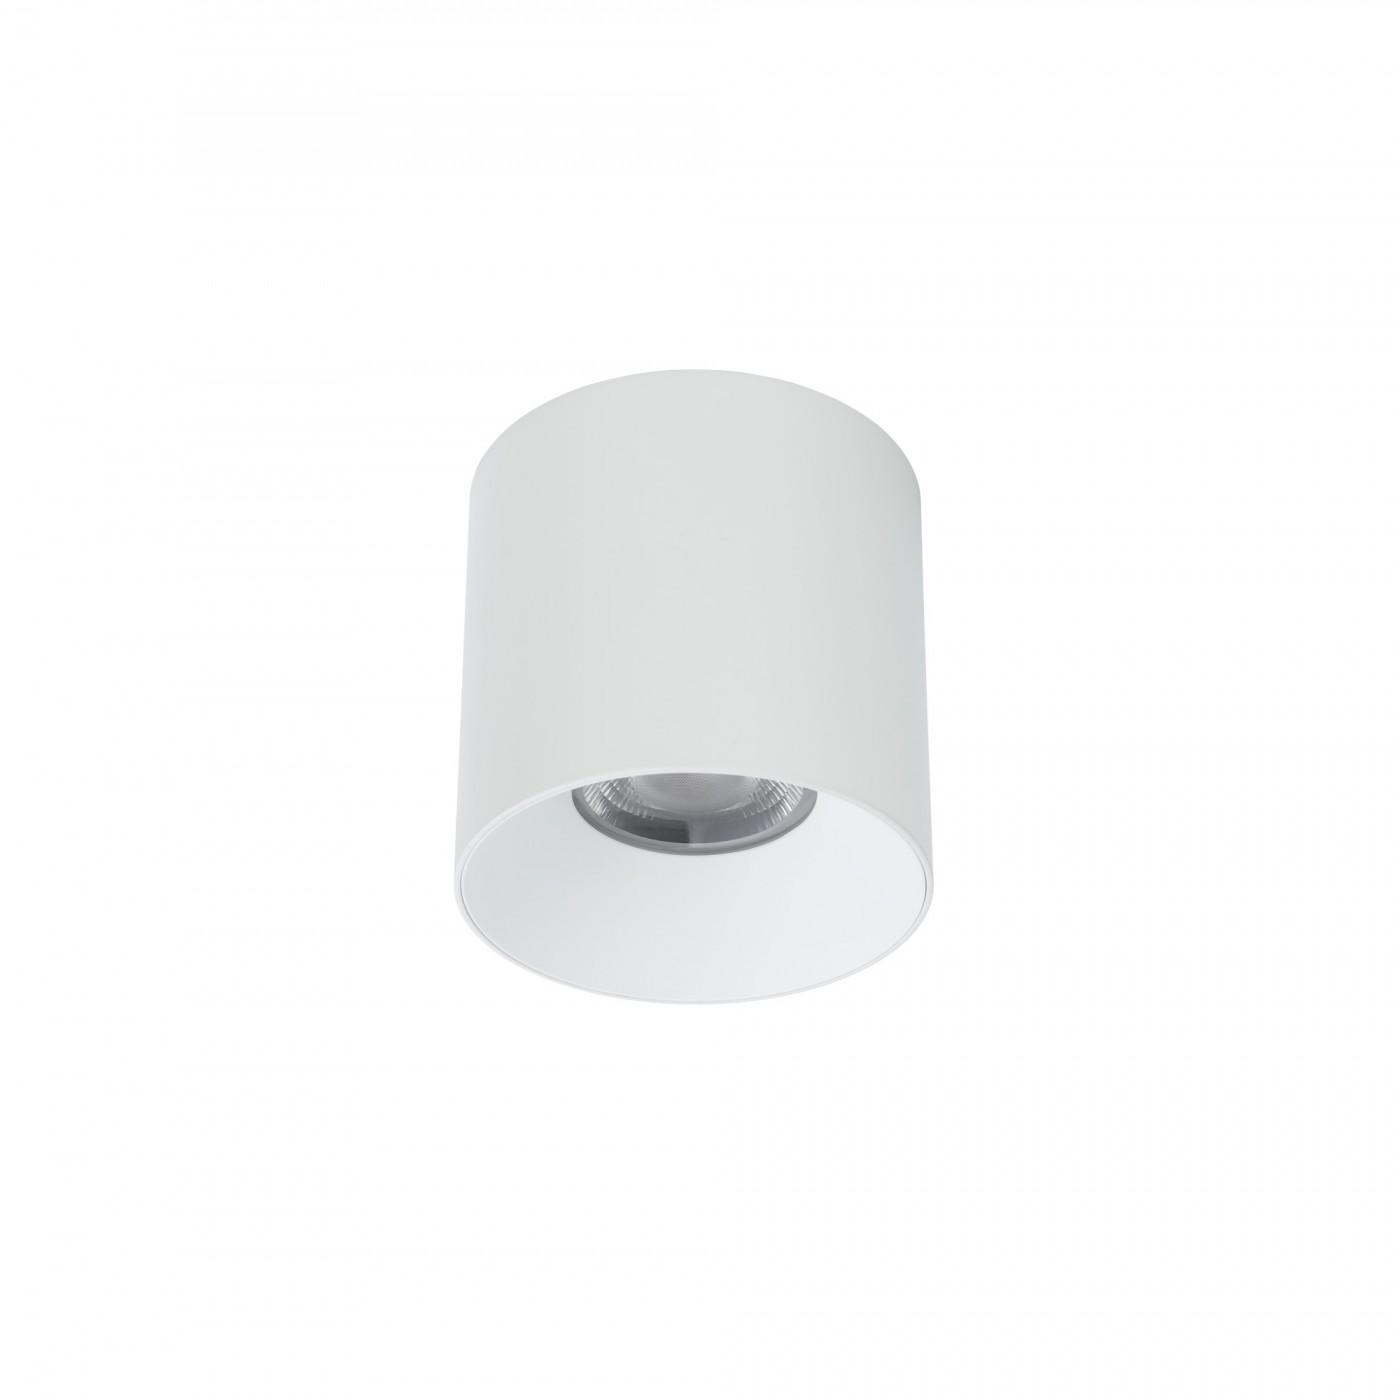 CL IOS LED 30W 4000K white 8730 Nowodvorski Lighting